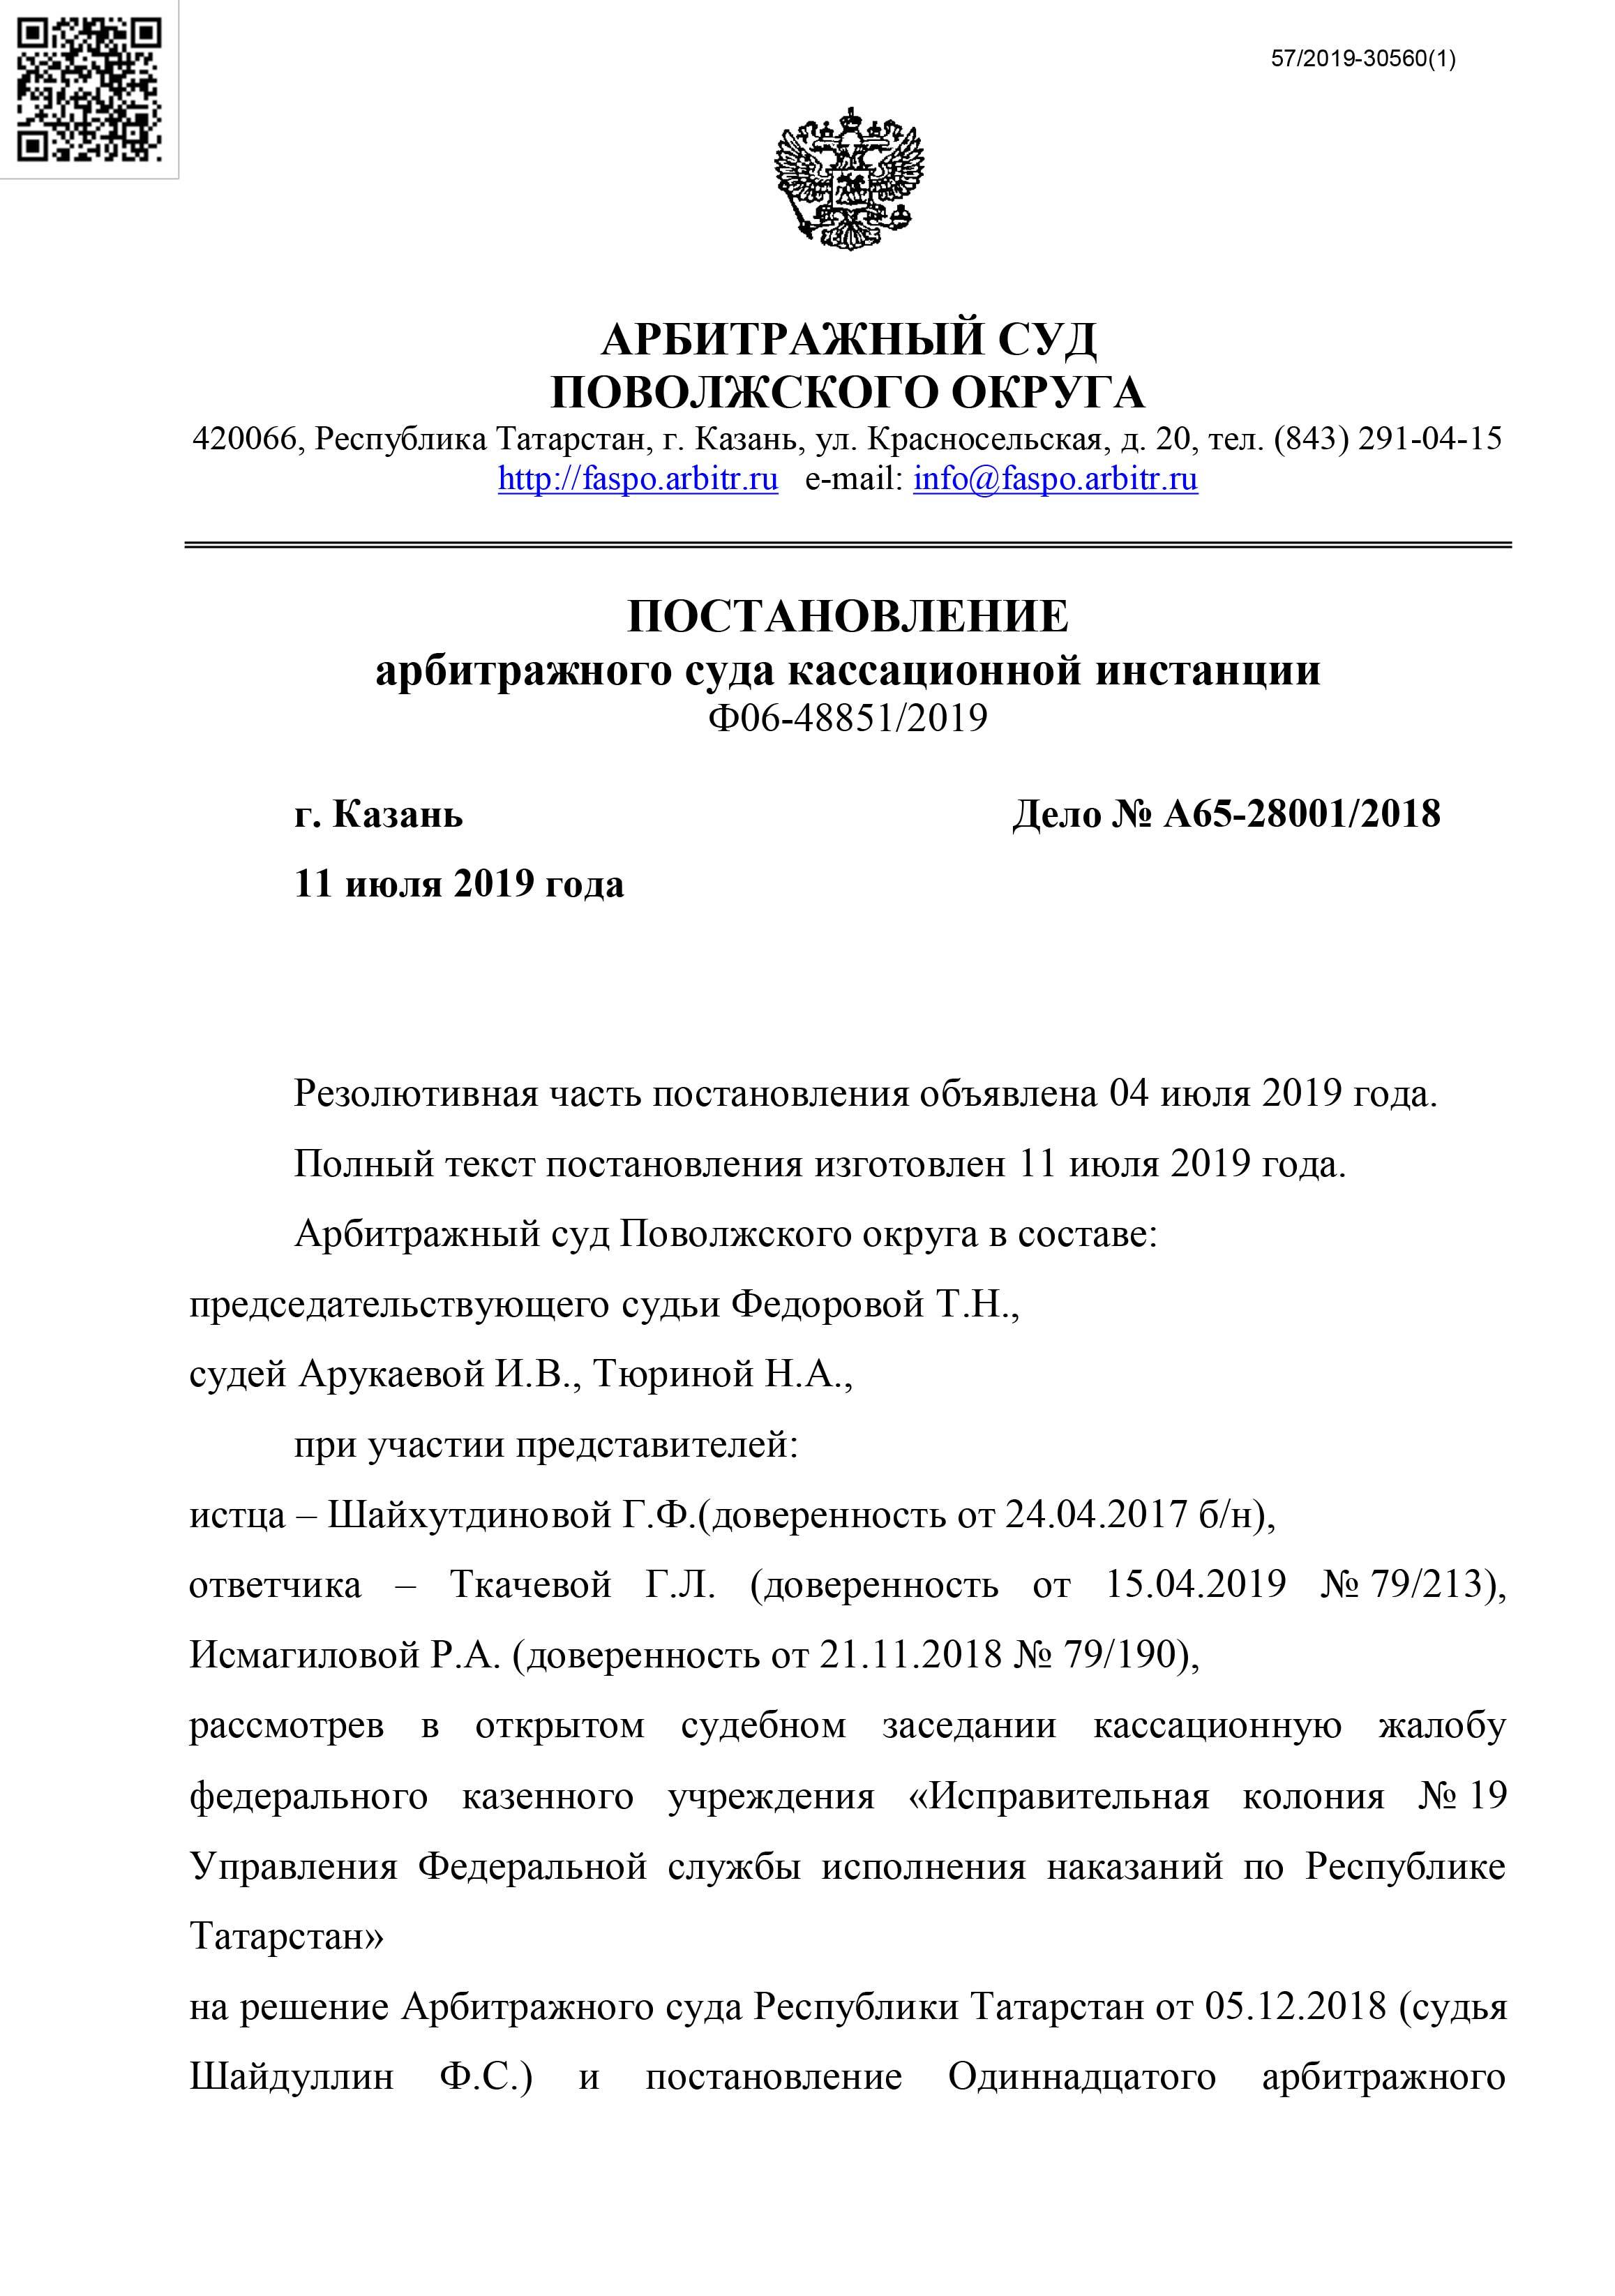 A65-28001-2018_20190711_Postanovlenie_kassacionnoj_instancii-1